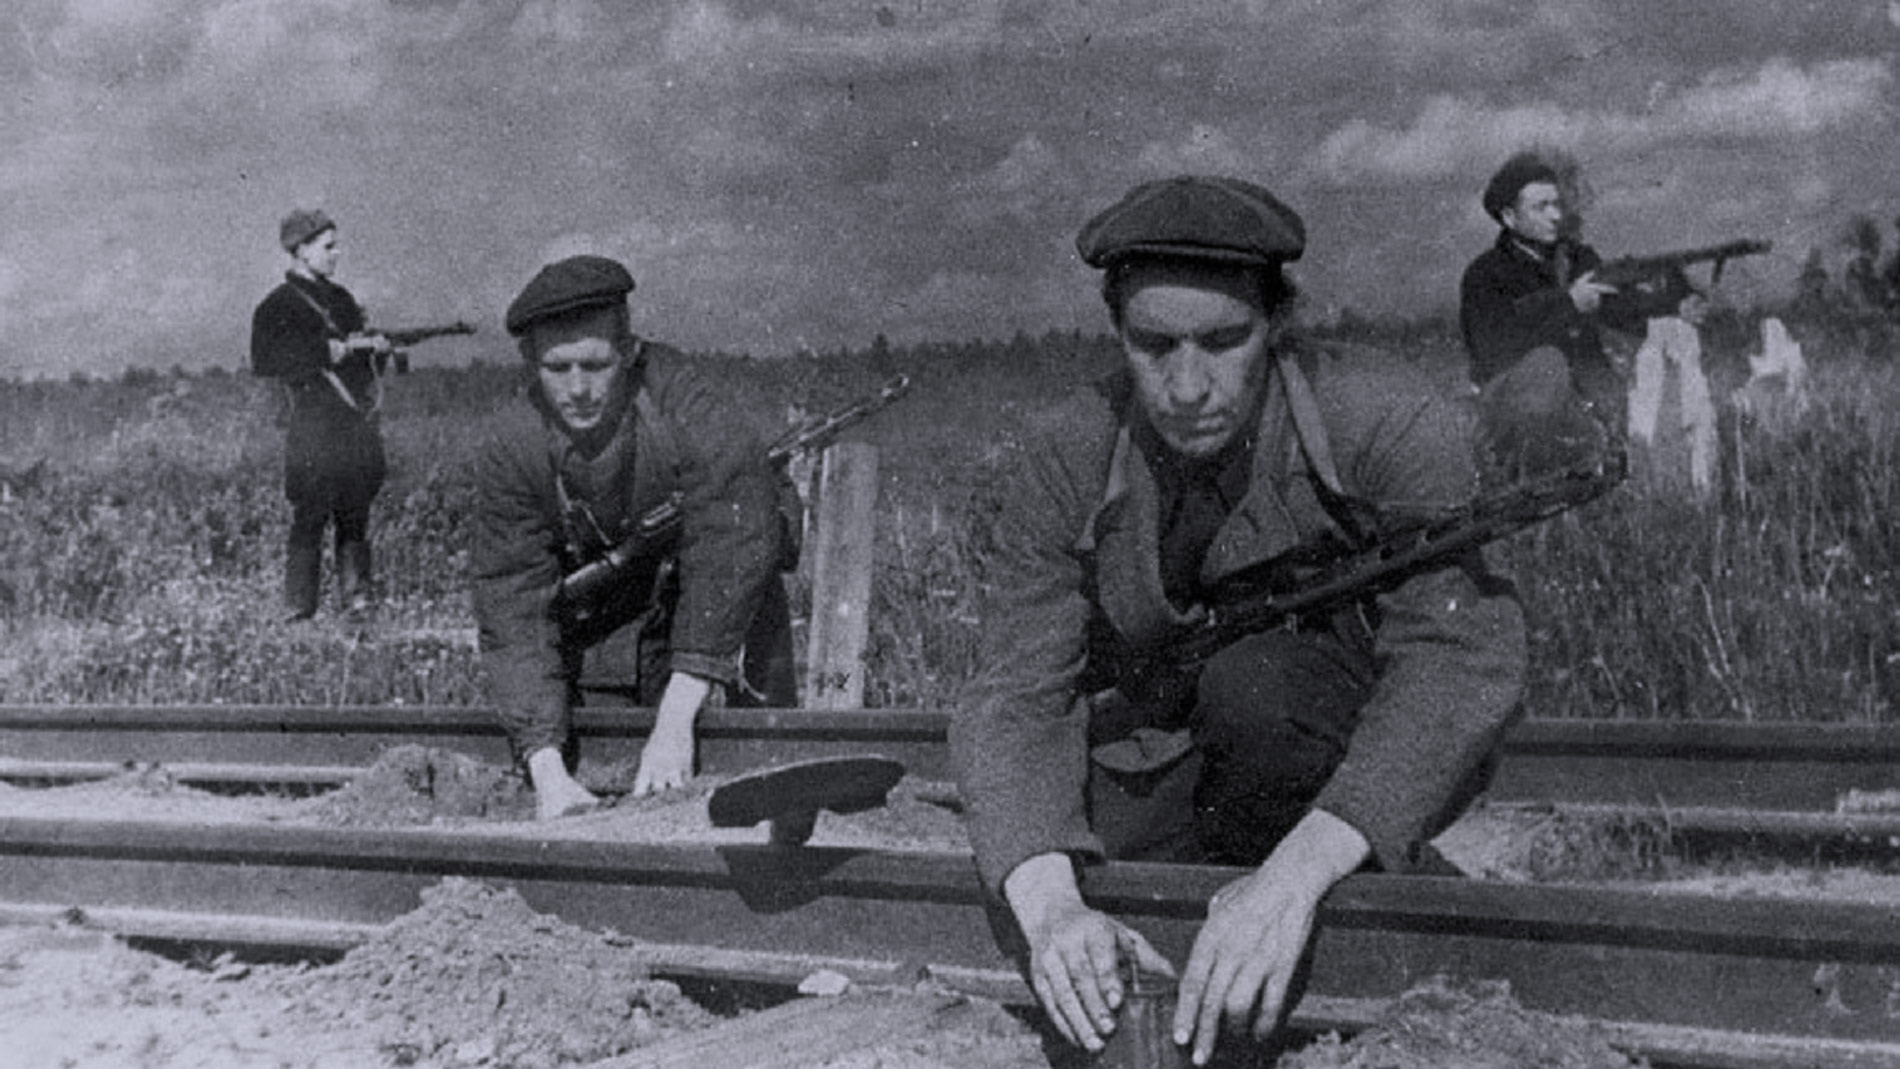 "<p>Фото © <a href=""https://www.polkmoskva.ru/articles/back/partizanskoe-i-podpolnoe-dvizhenie/"" target=""_blank"" rel=""noopener noreferrer"">polkmoskva.ru</a></p>"